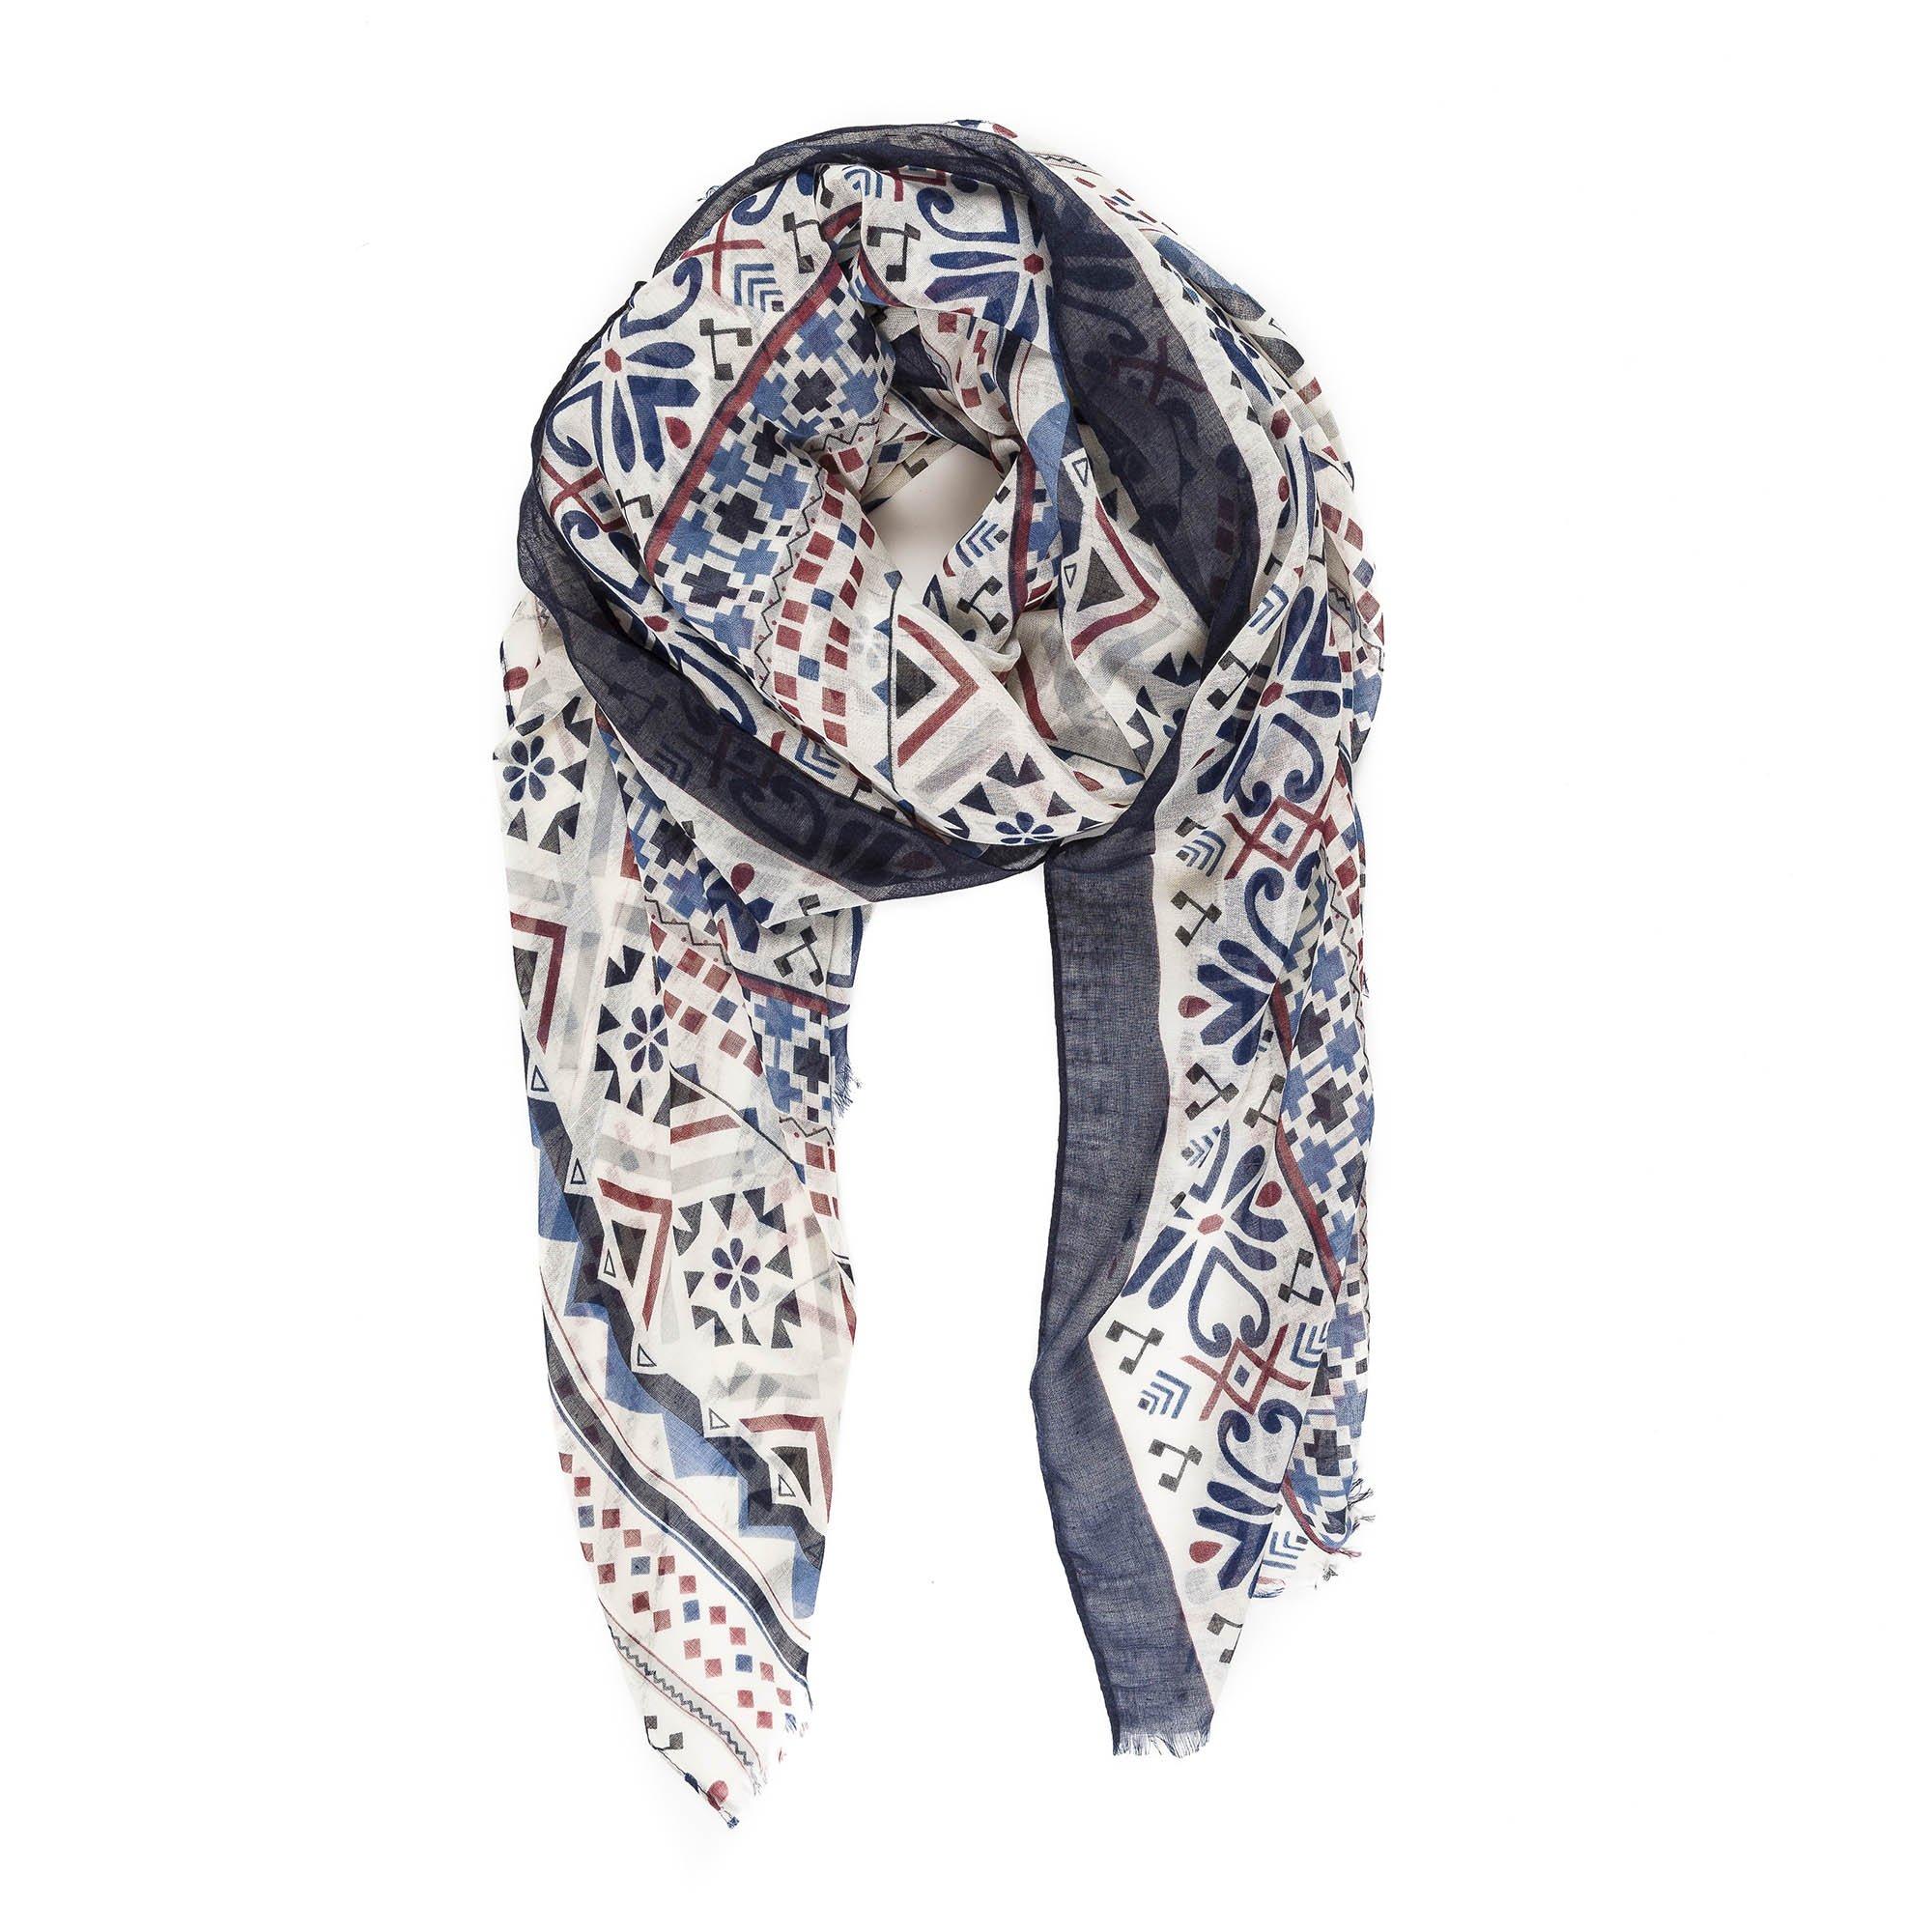 Scarf for Women Lightweight Geometric Pattern Fashion Fall Winter Scarves Shawl Wraps by Melifluos (NF17-2)